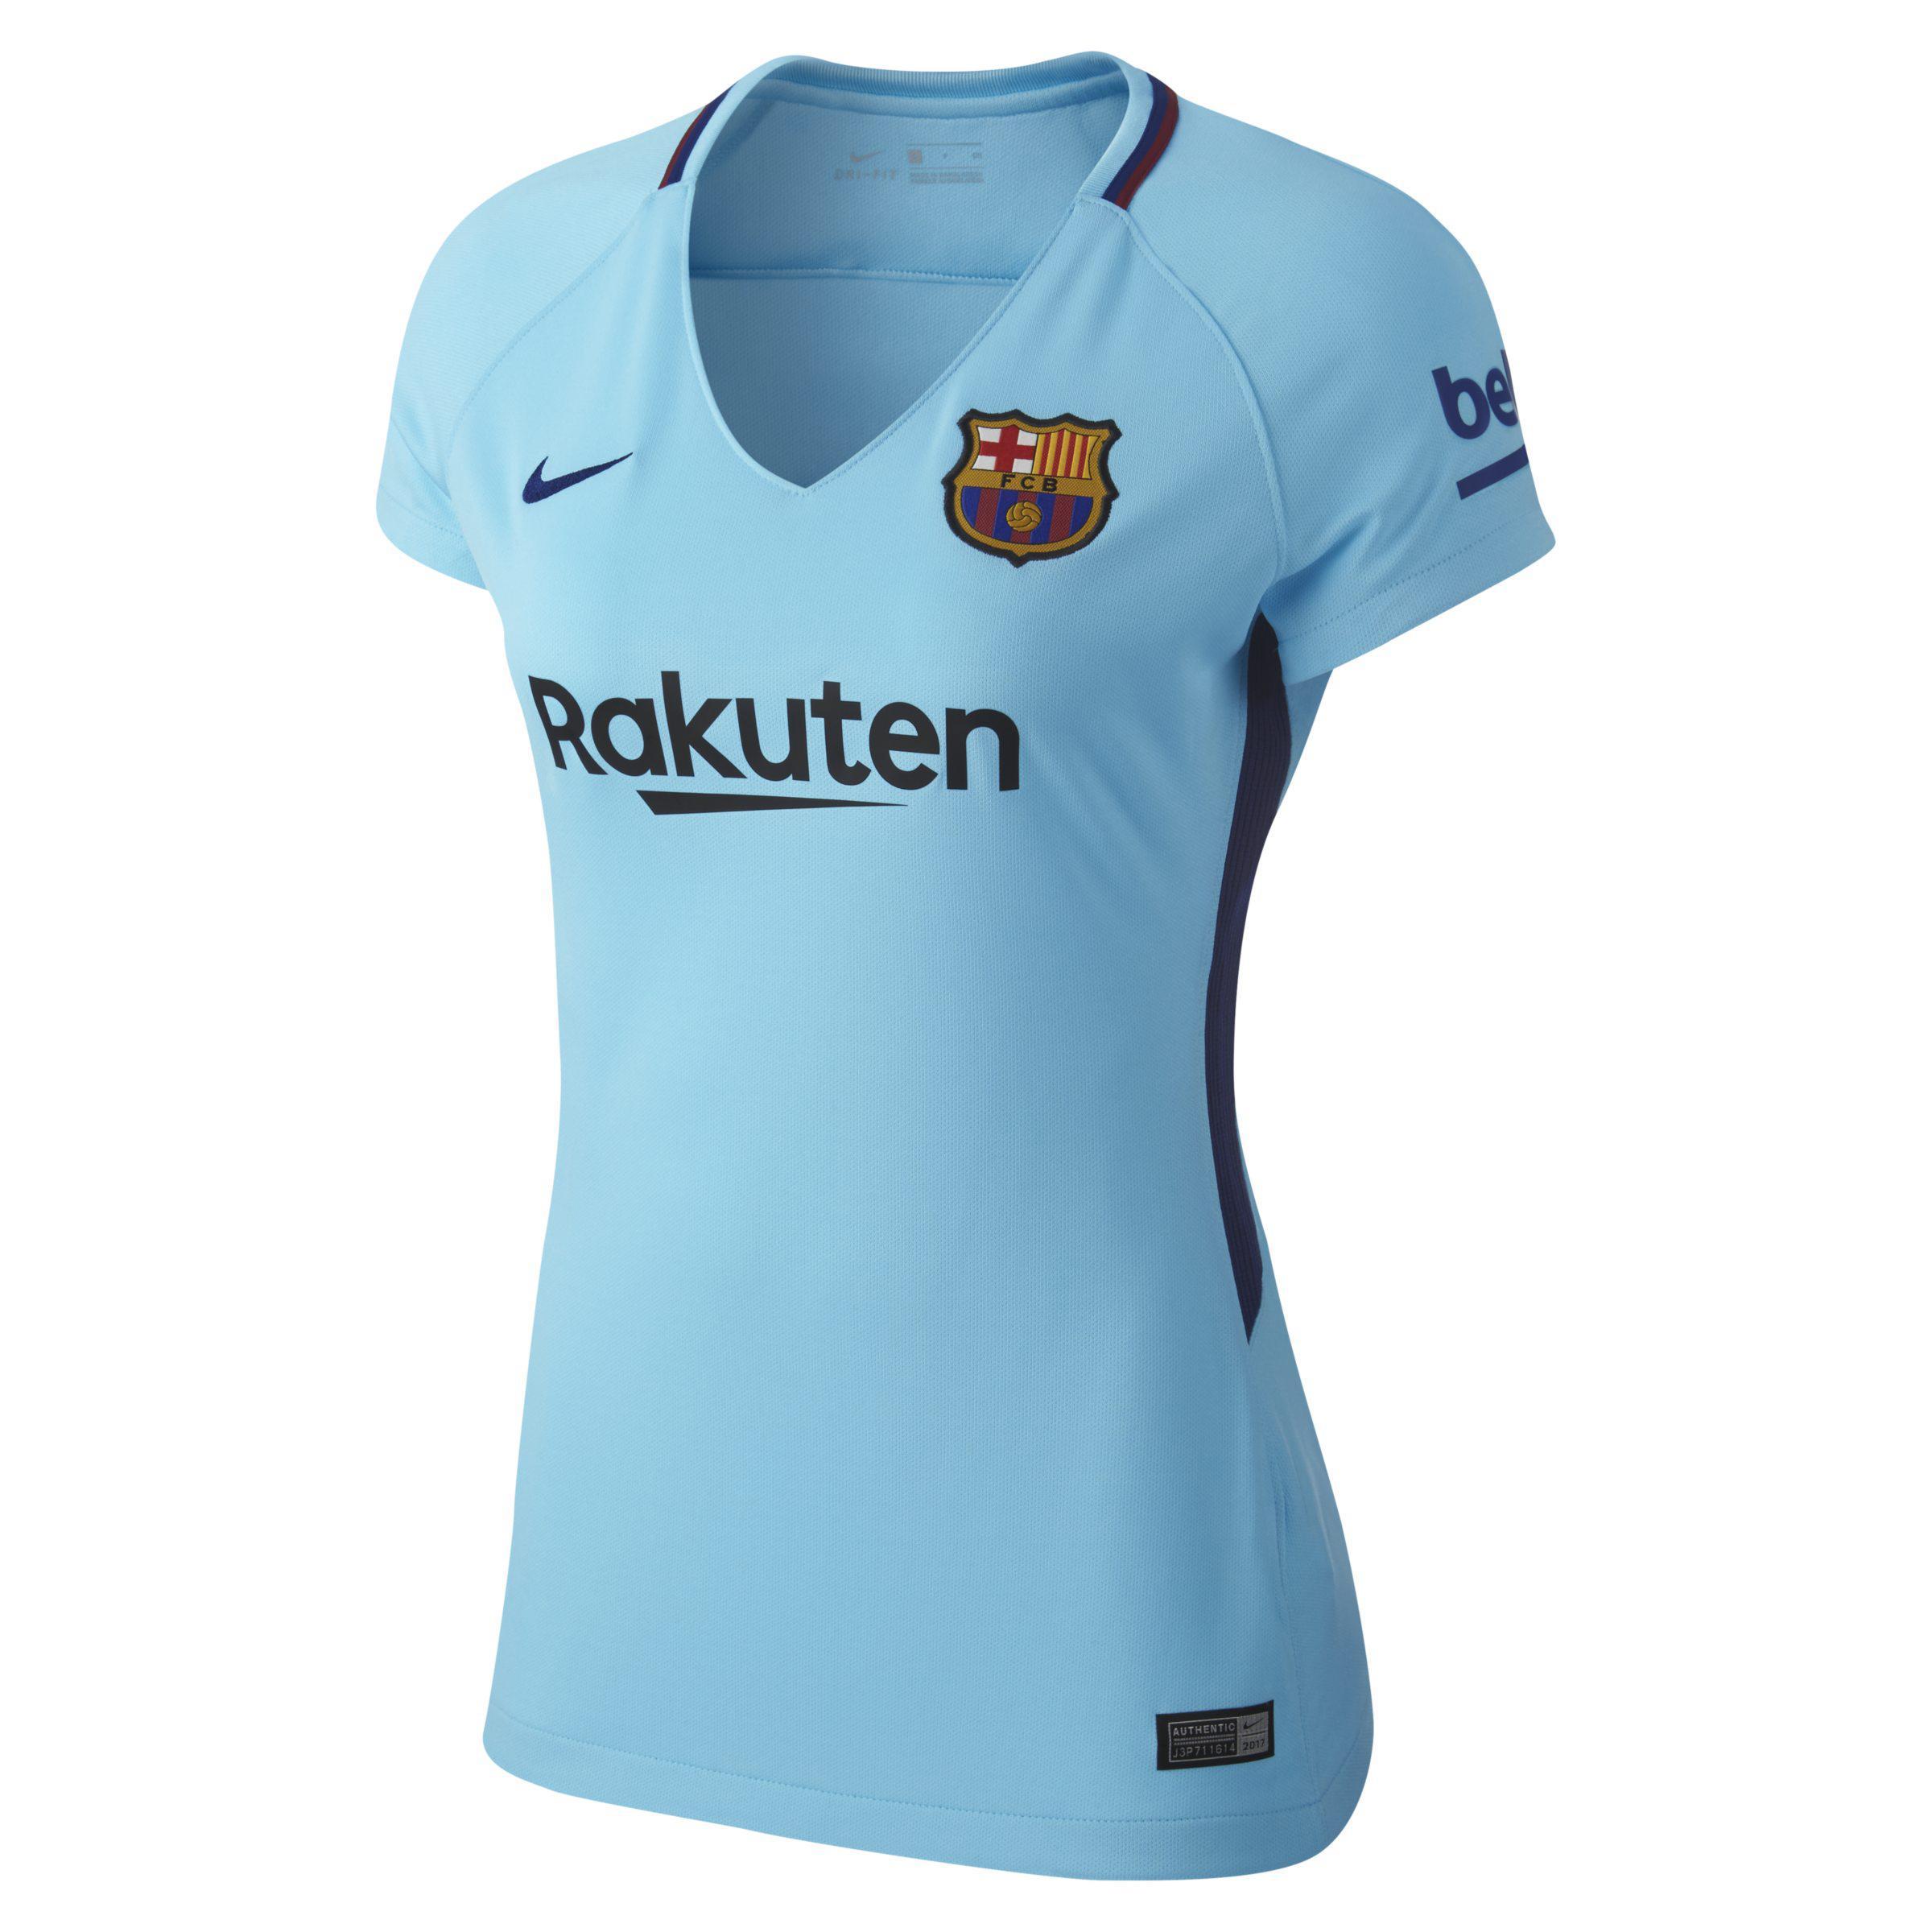 7922bd8bf5d6 Nike 2017 18 Fc Barcelona Stadium Away Football Shirt in Blue - Lyst